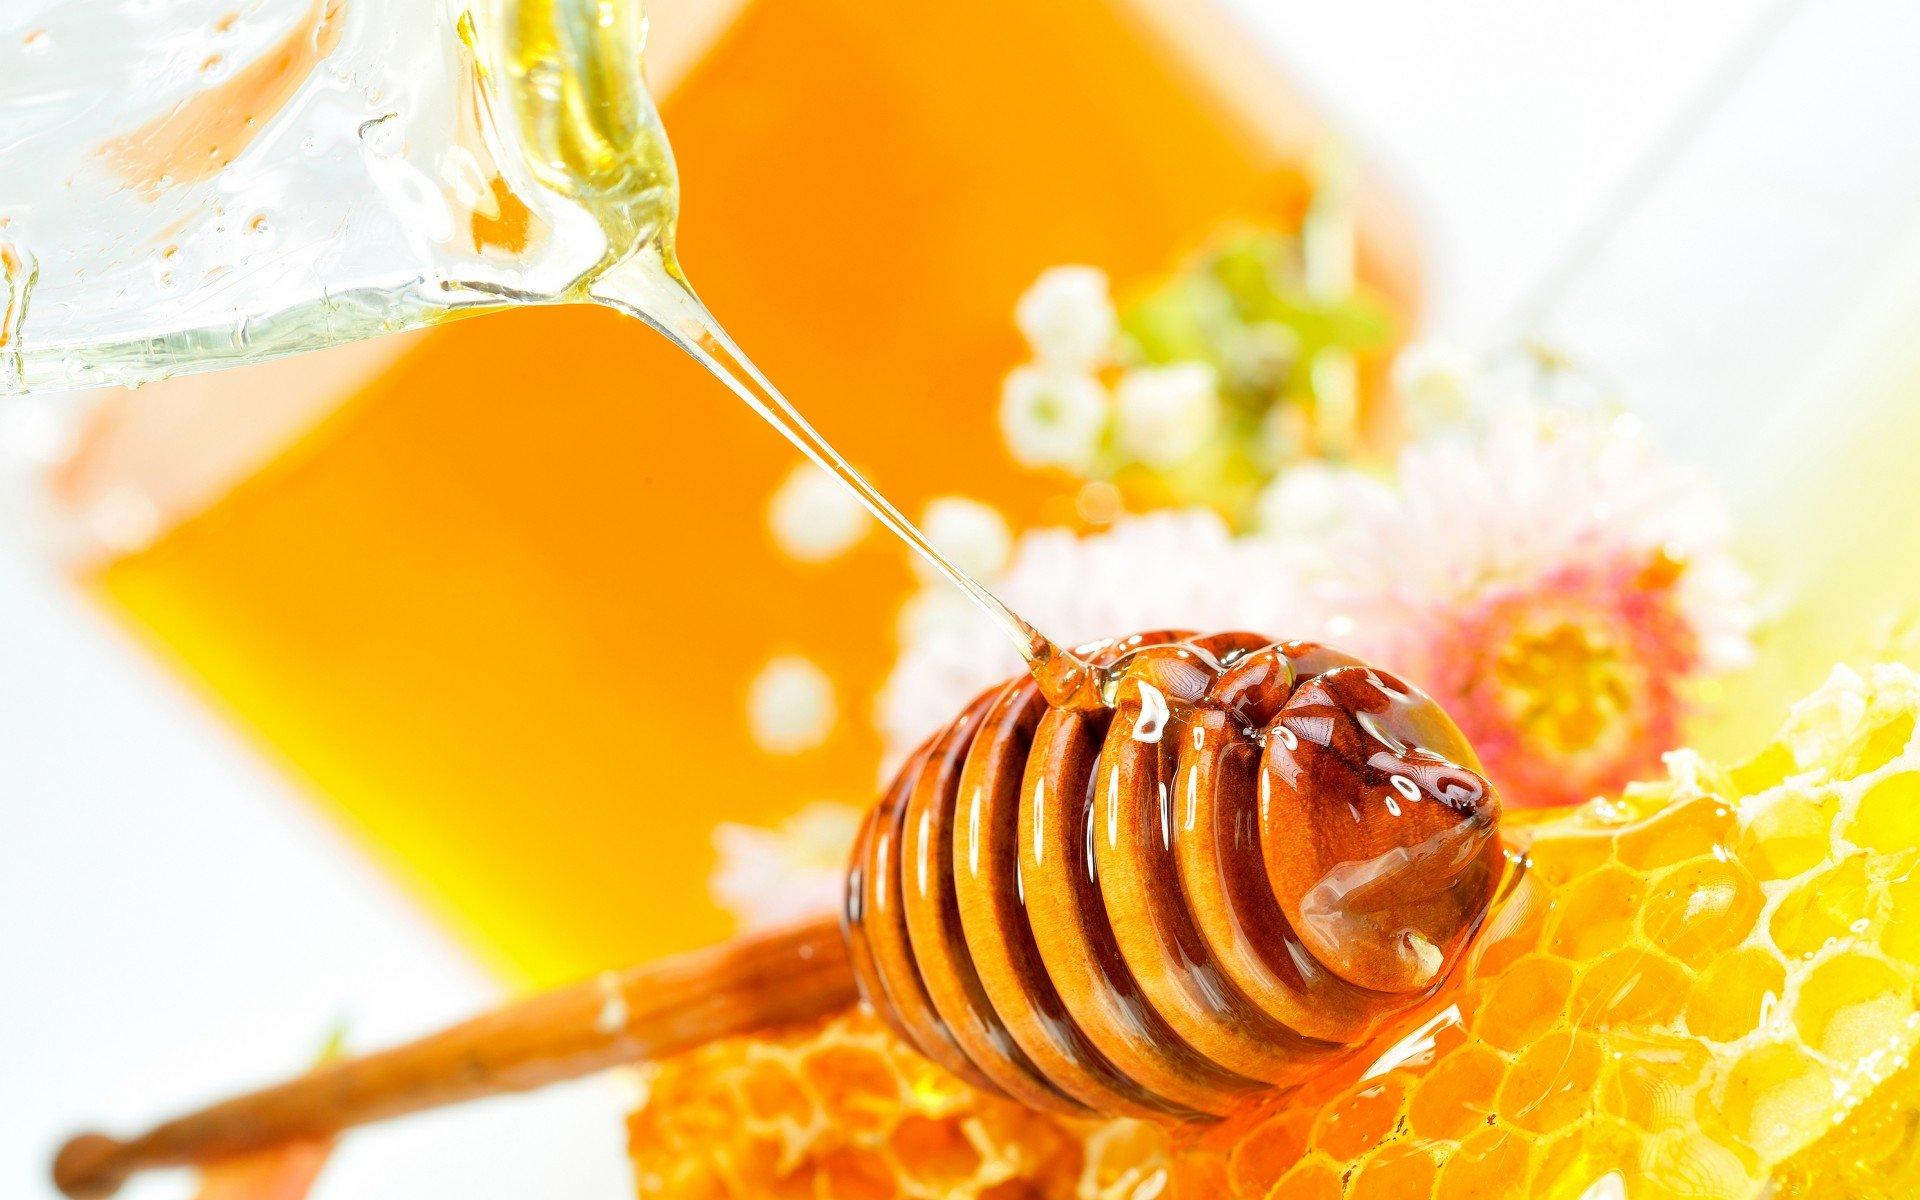 manfaat madu asli untuk kecantikan